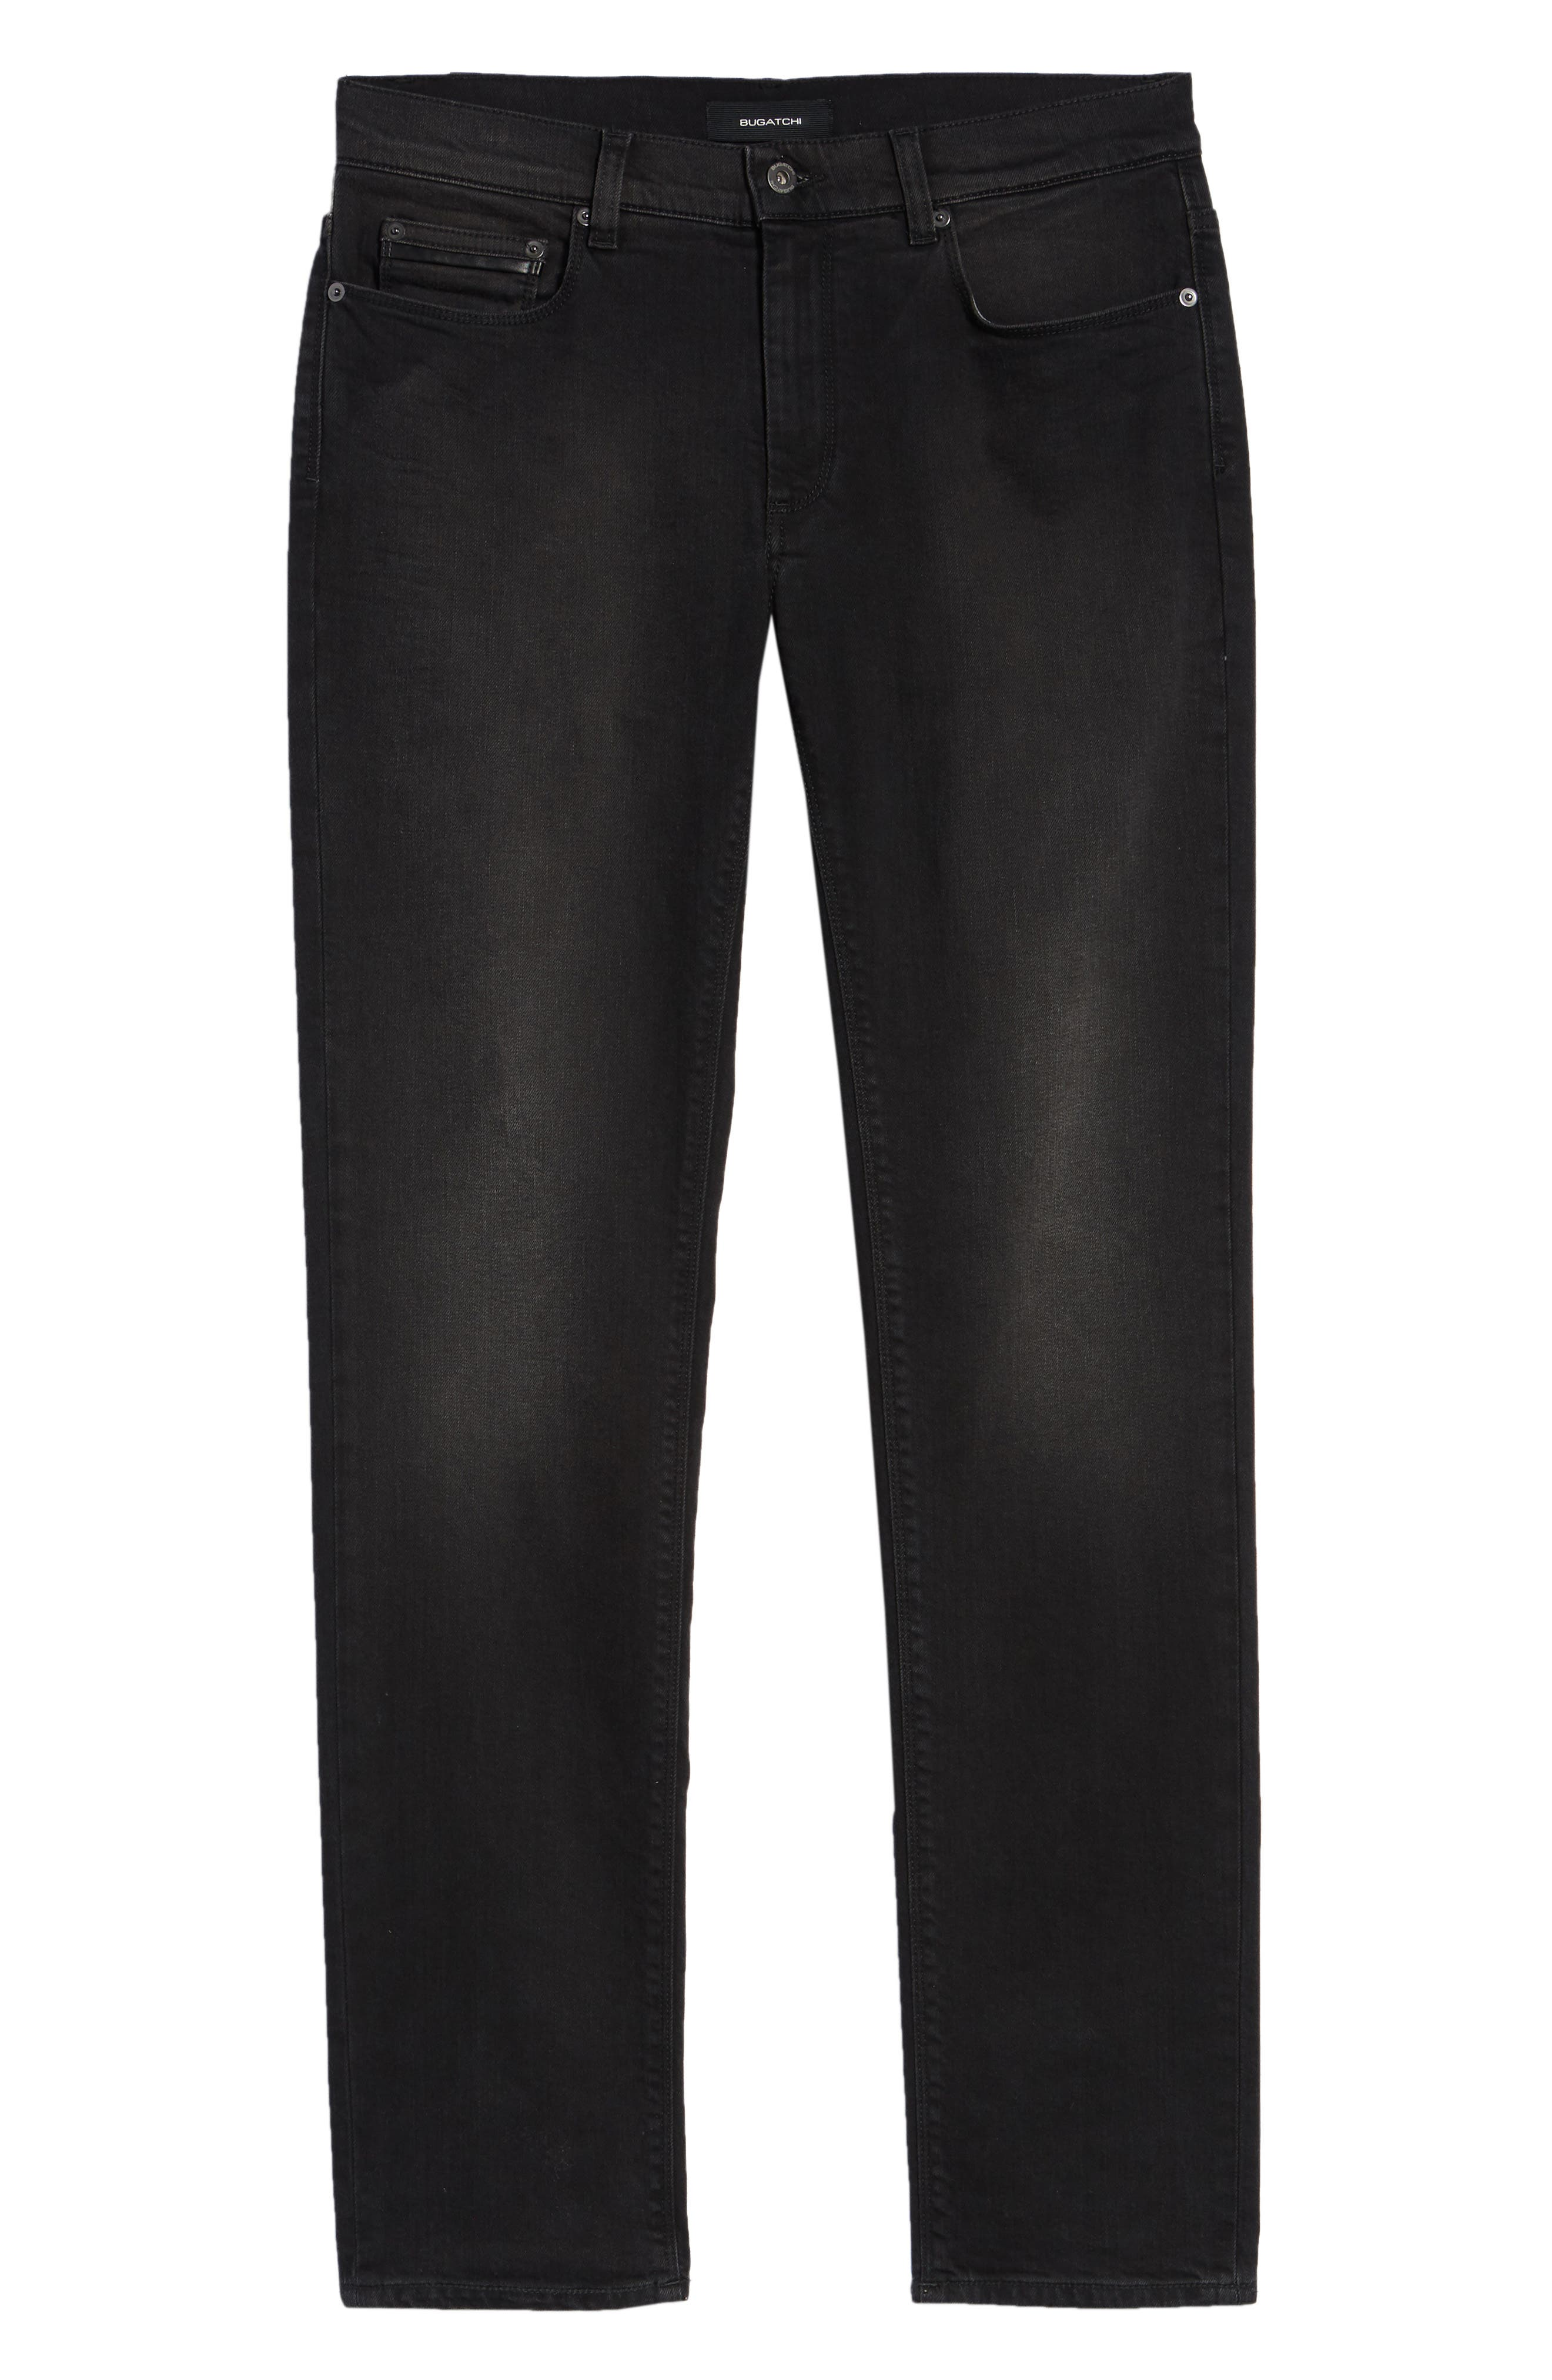 Slim Fit Jeans,                             Alternate thumbnail 6, color,                             BLACK